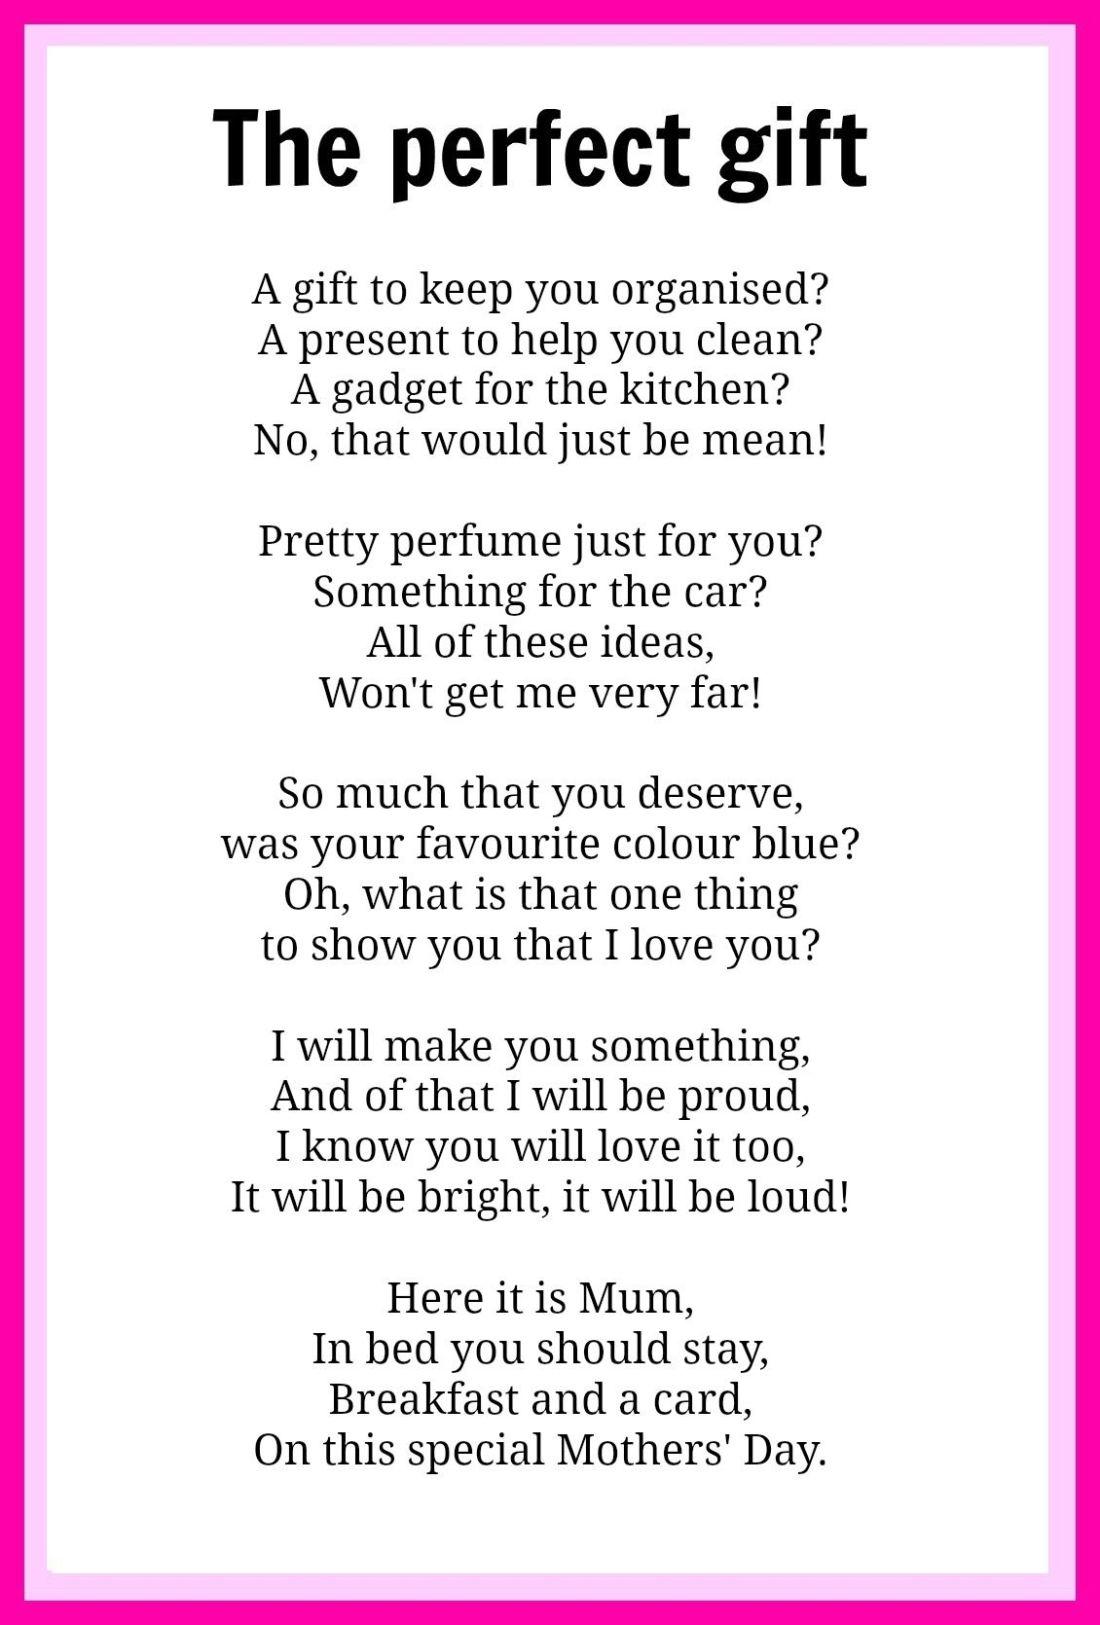 Mothers day poems mothers day poems poems and poem